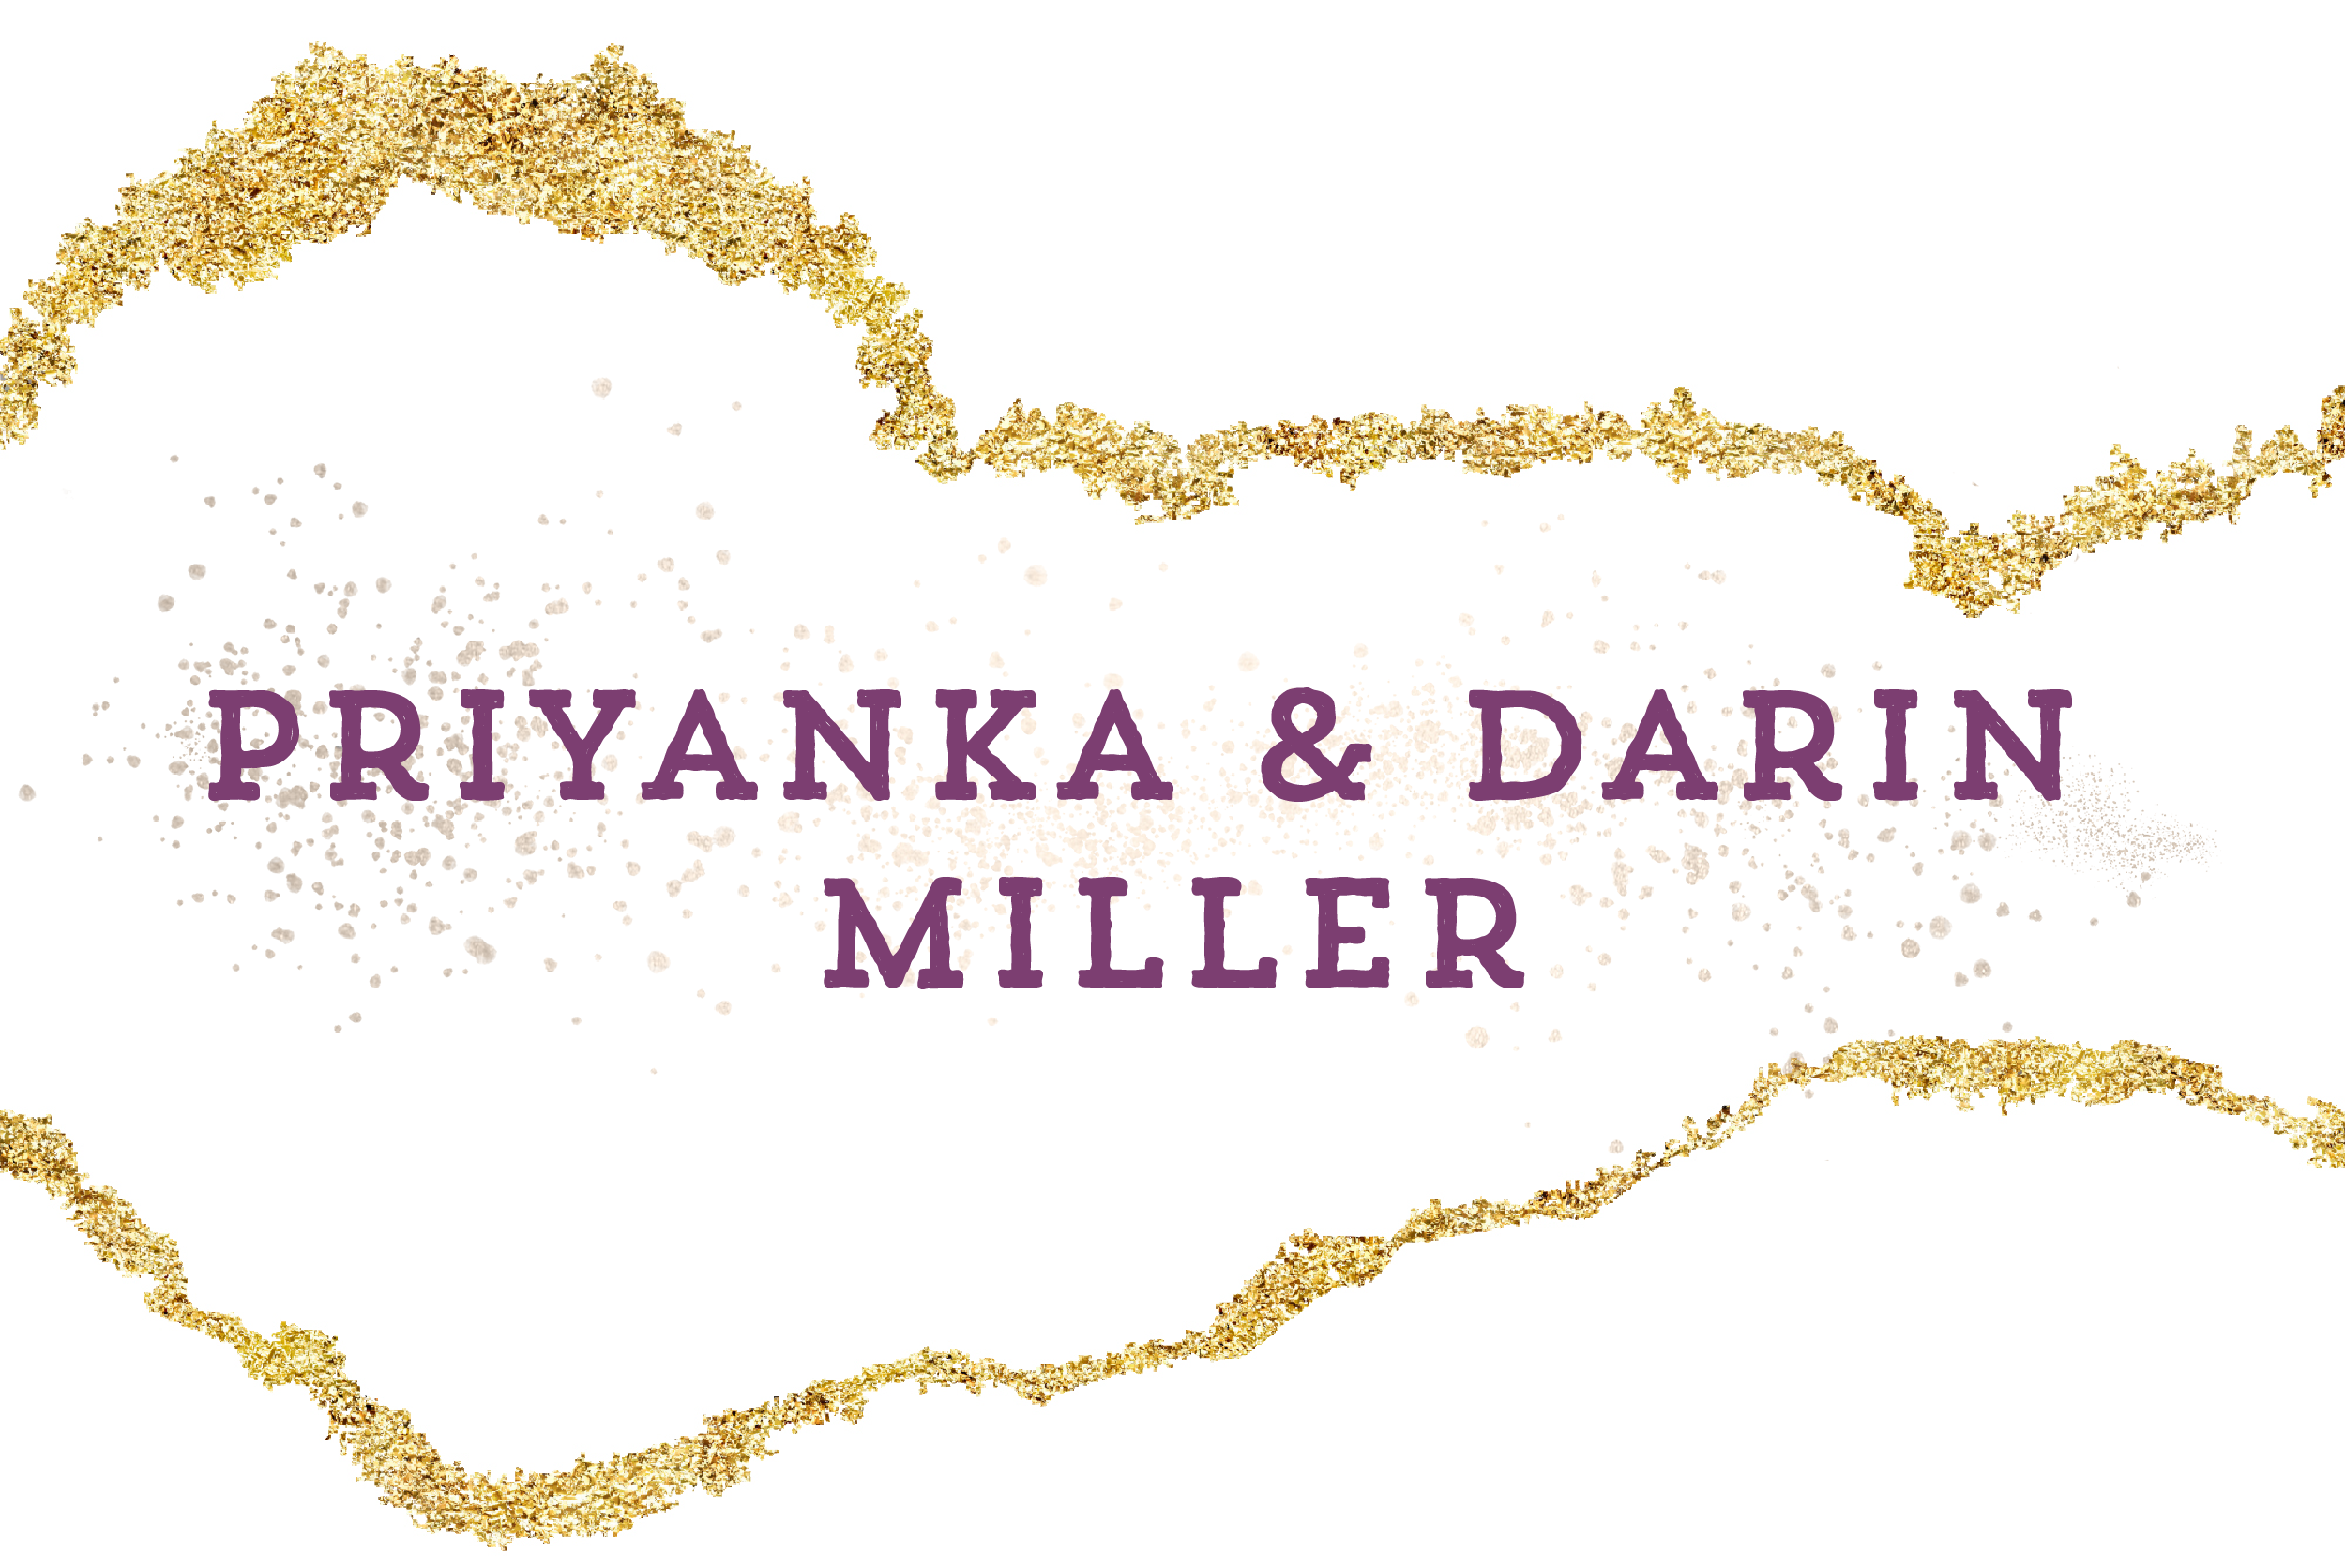 Priyanka and Darin Miller